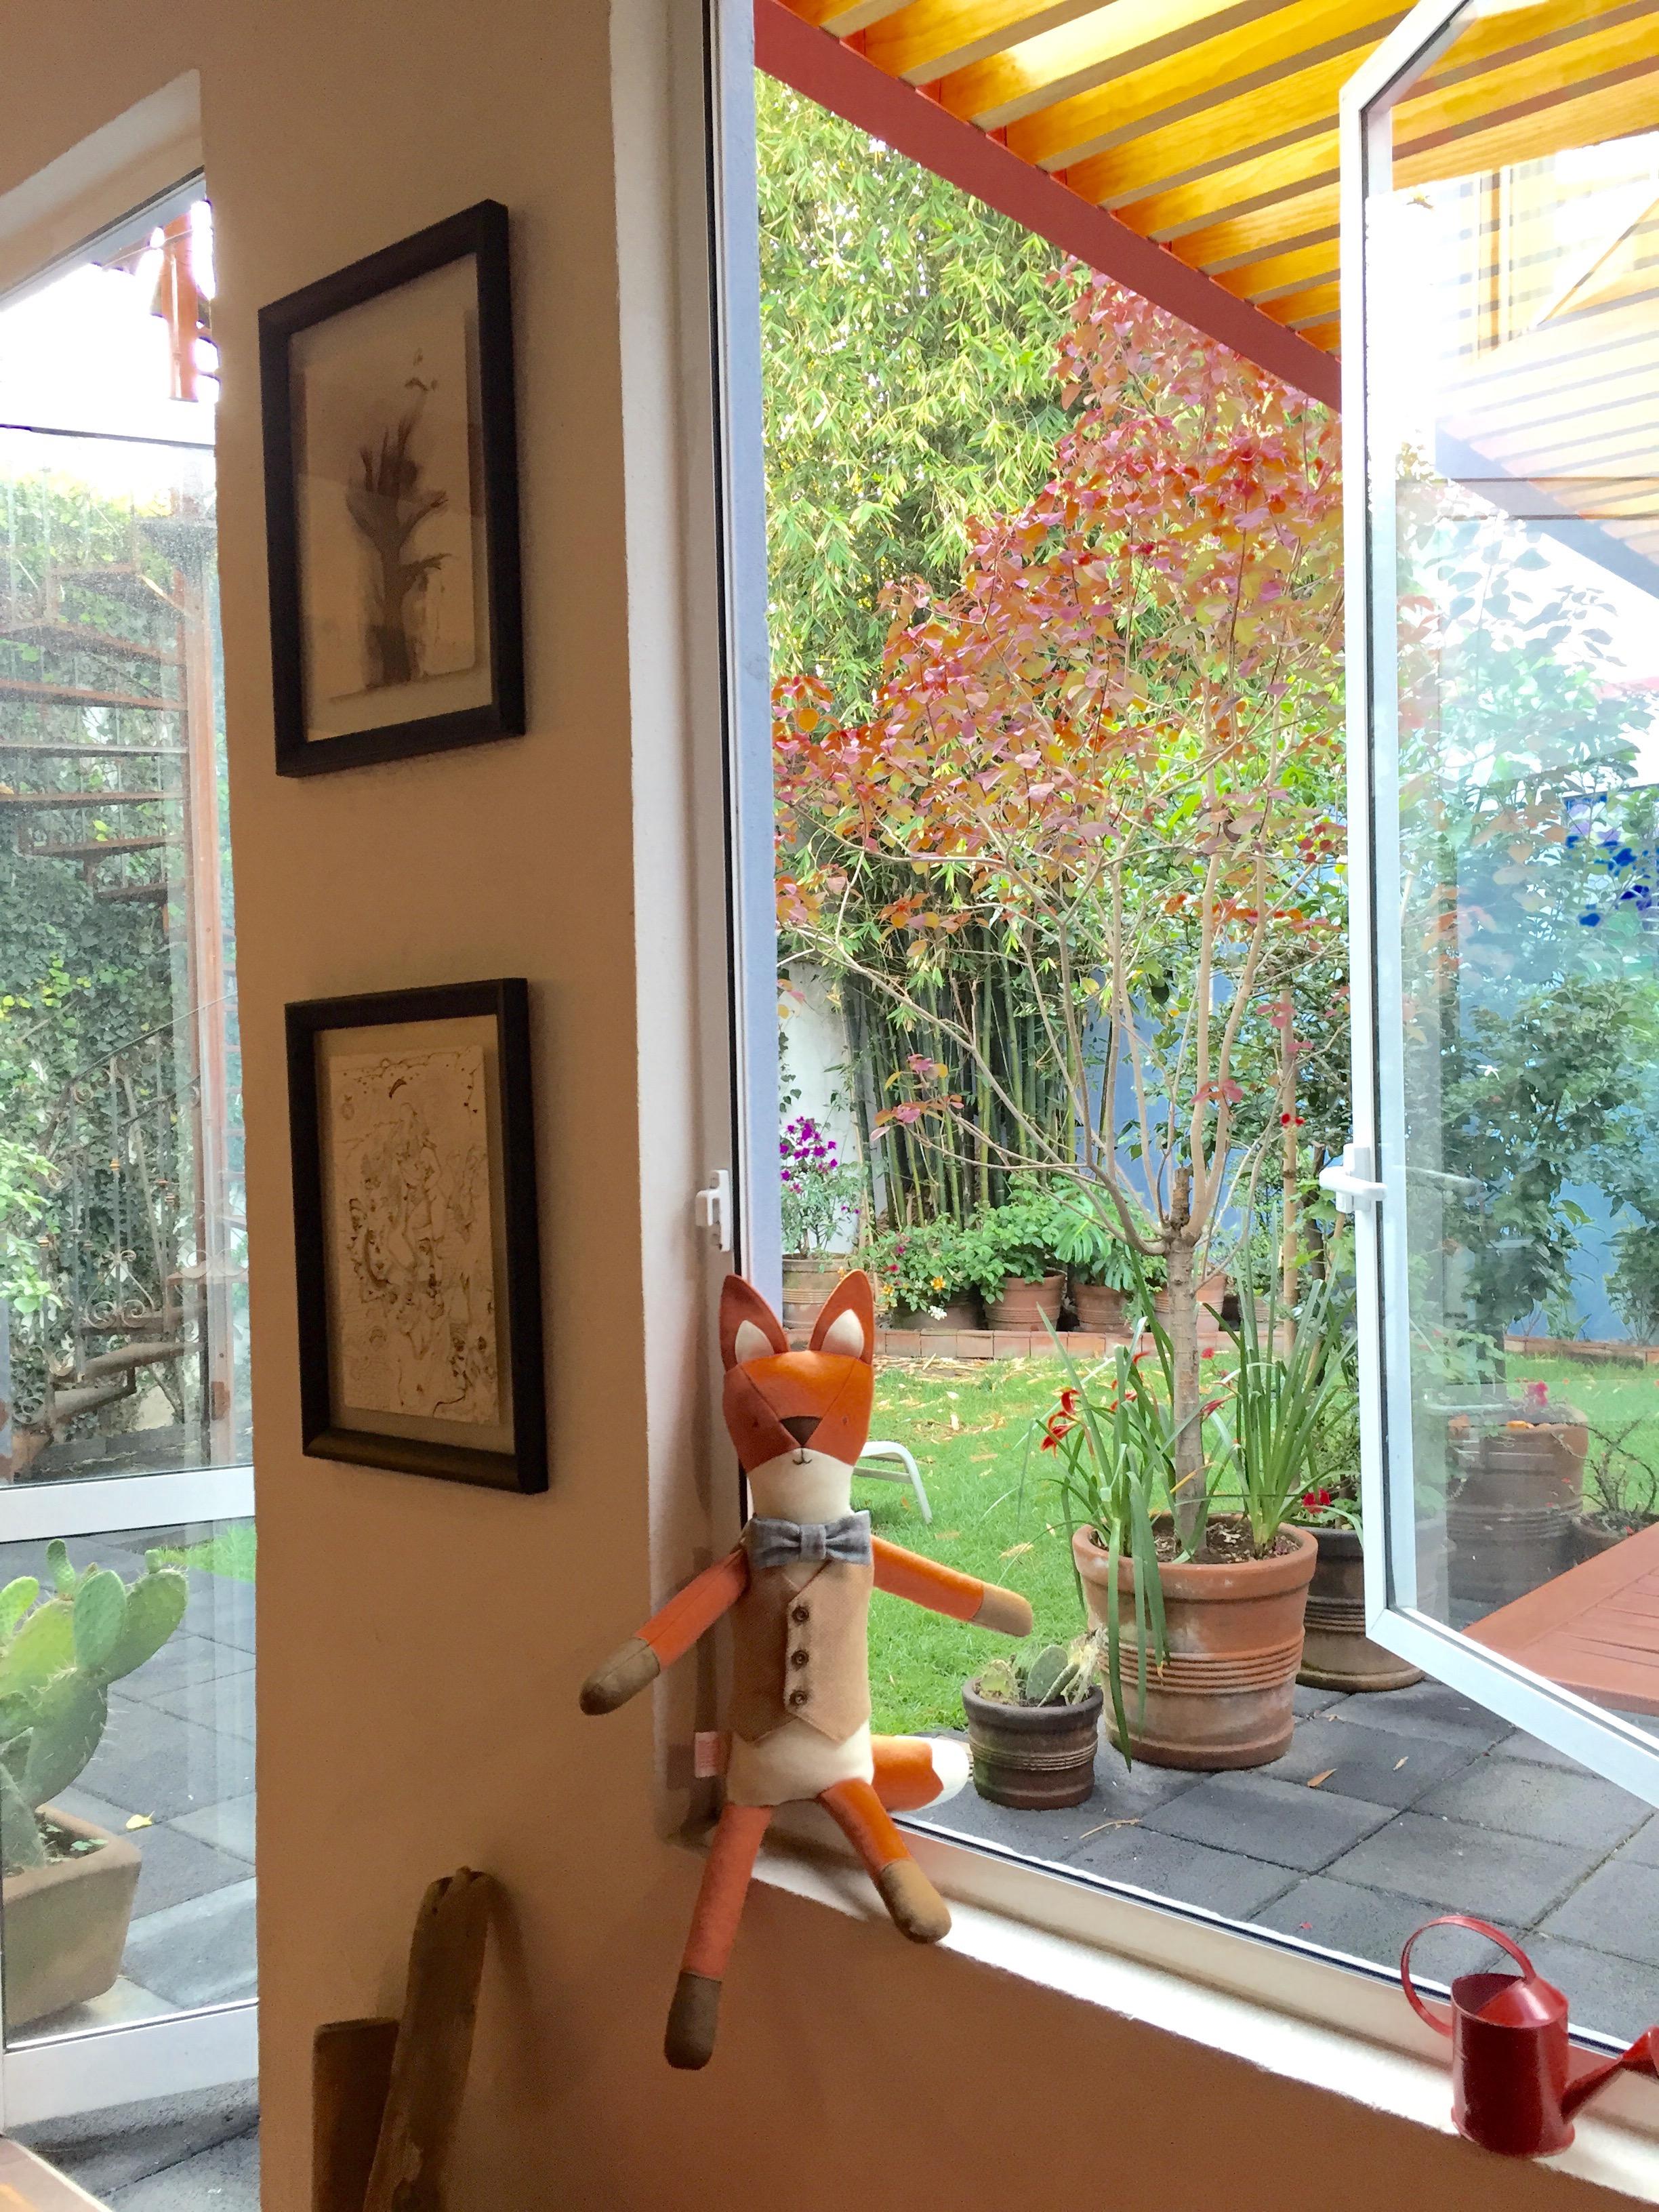 Henry the Fox enjoying fresh morning air